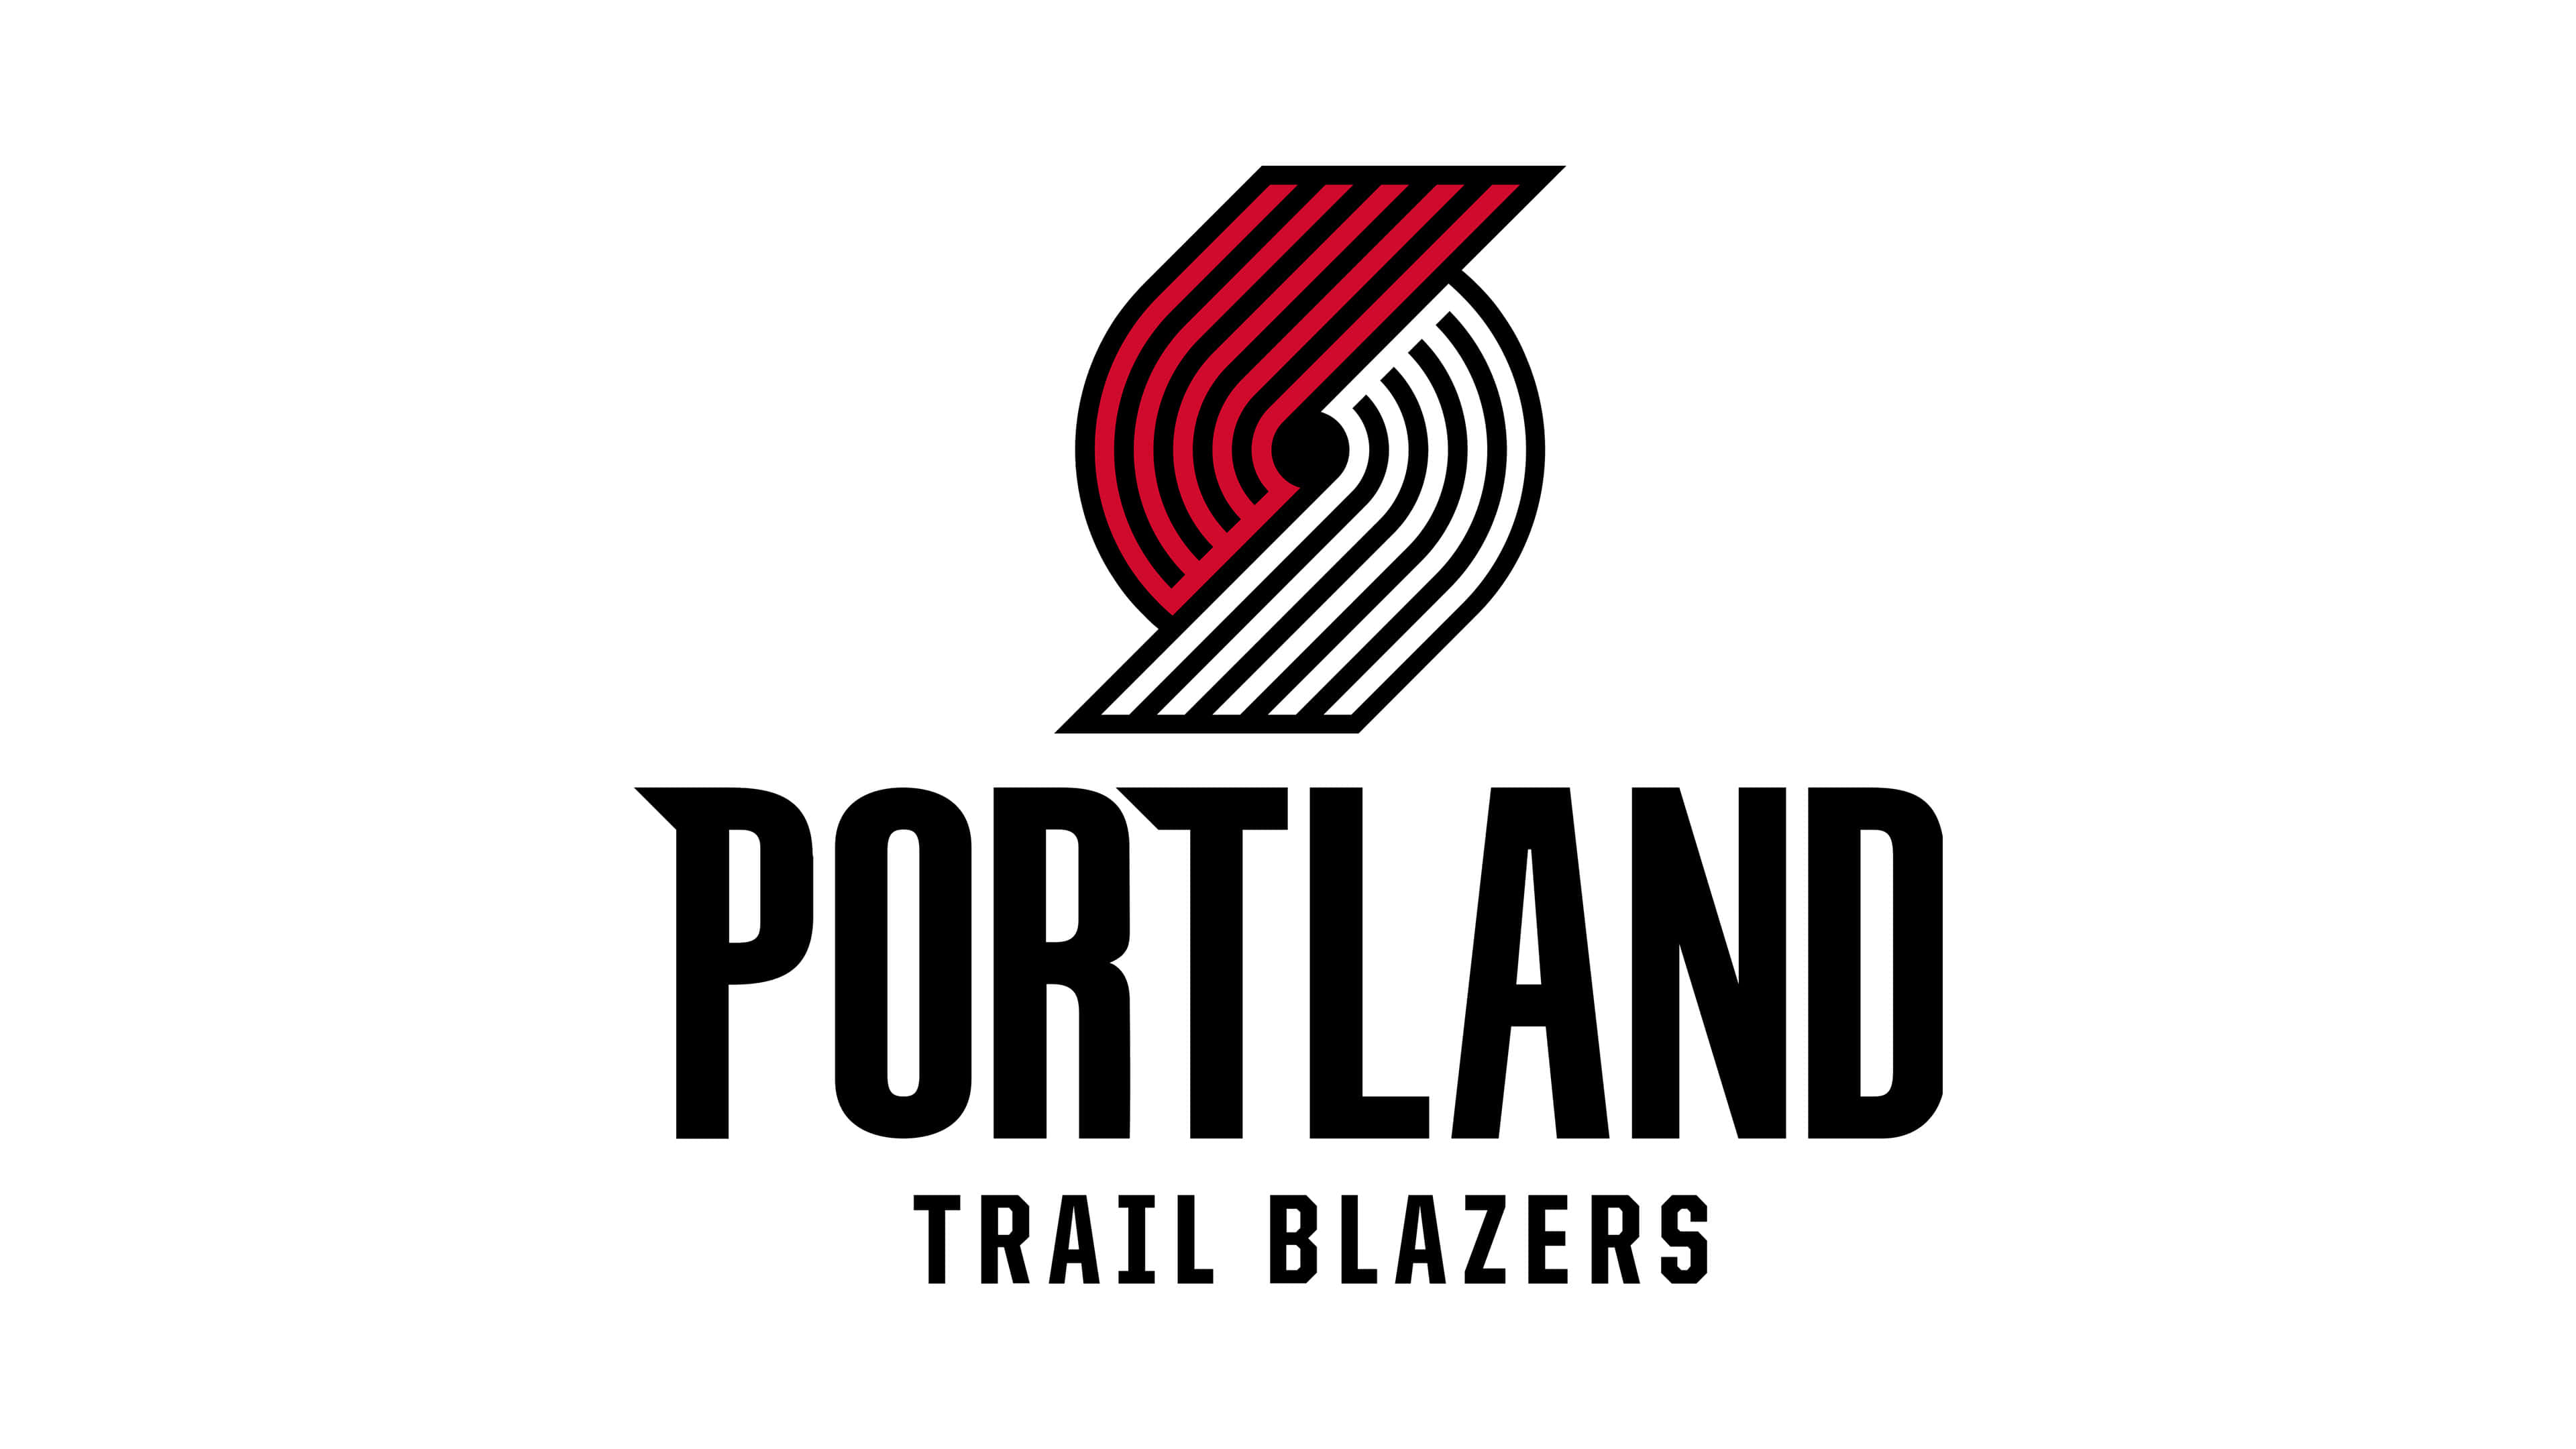 portland trail blazers nba logo uhd 4k wallpaper